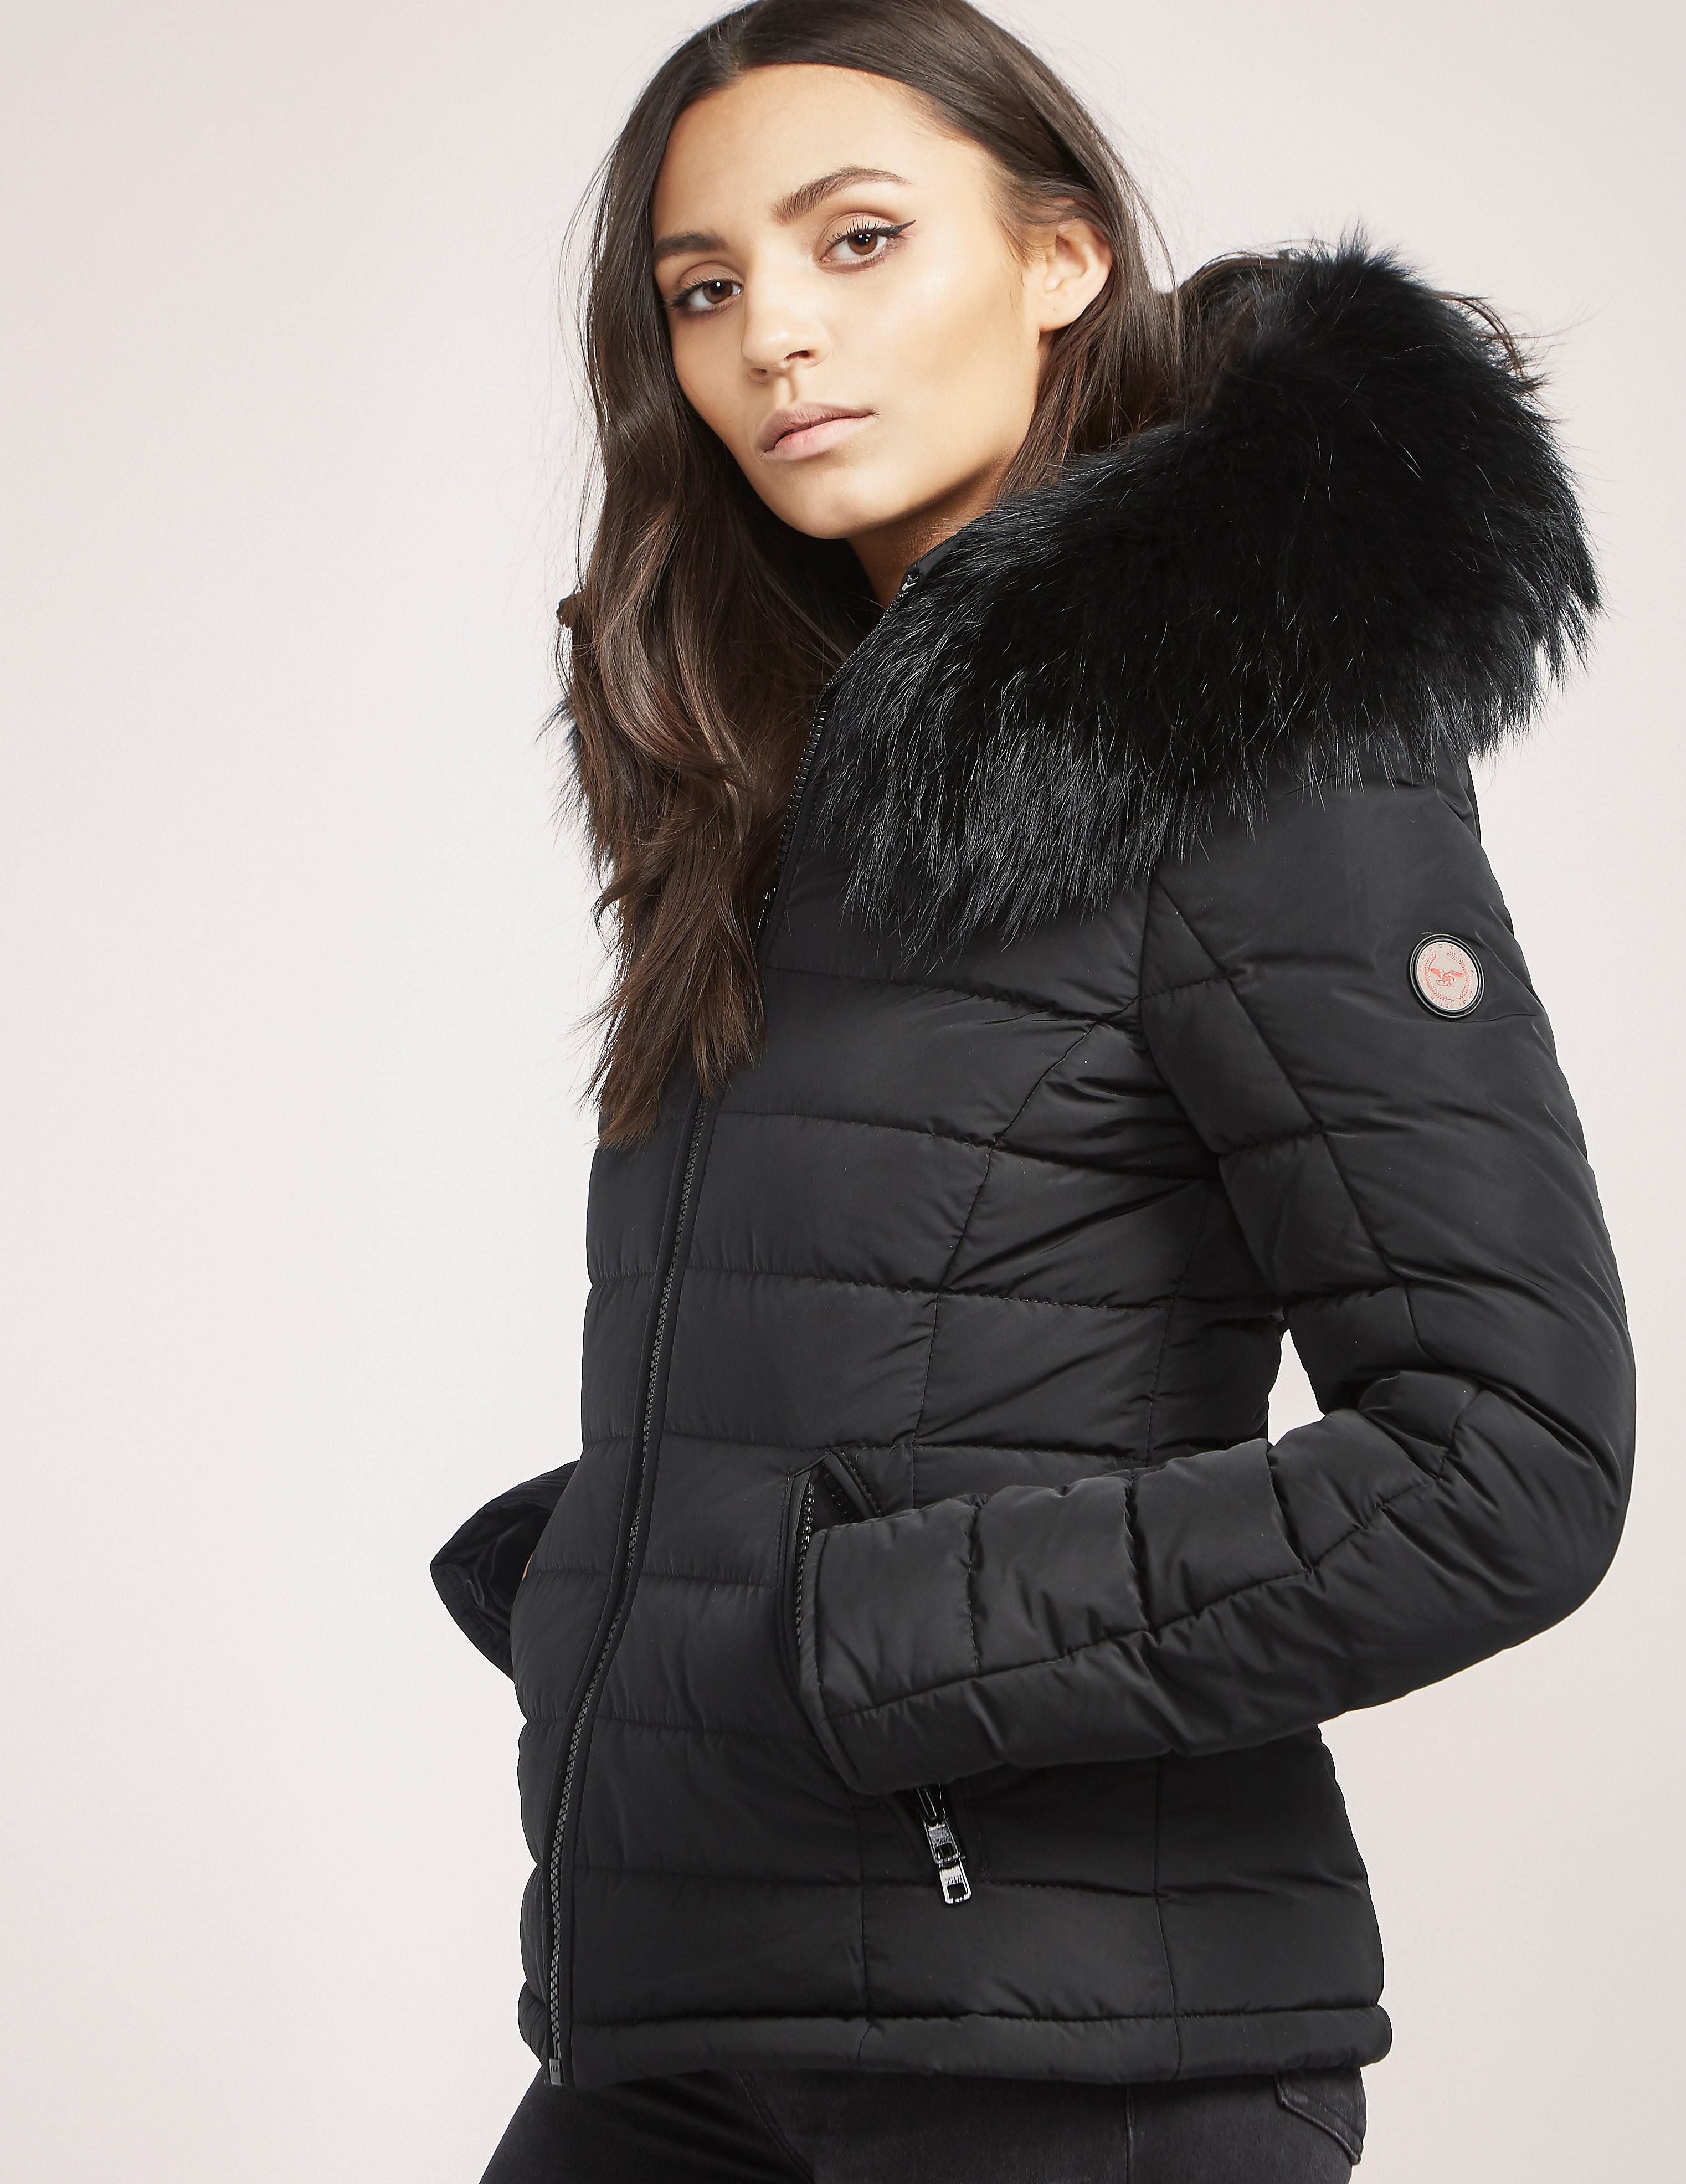 Froccella B-153 Big Padded Fur Jacket